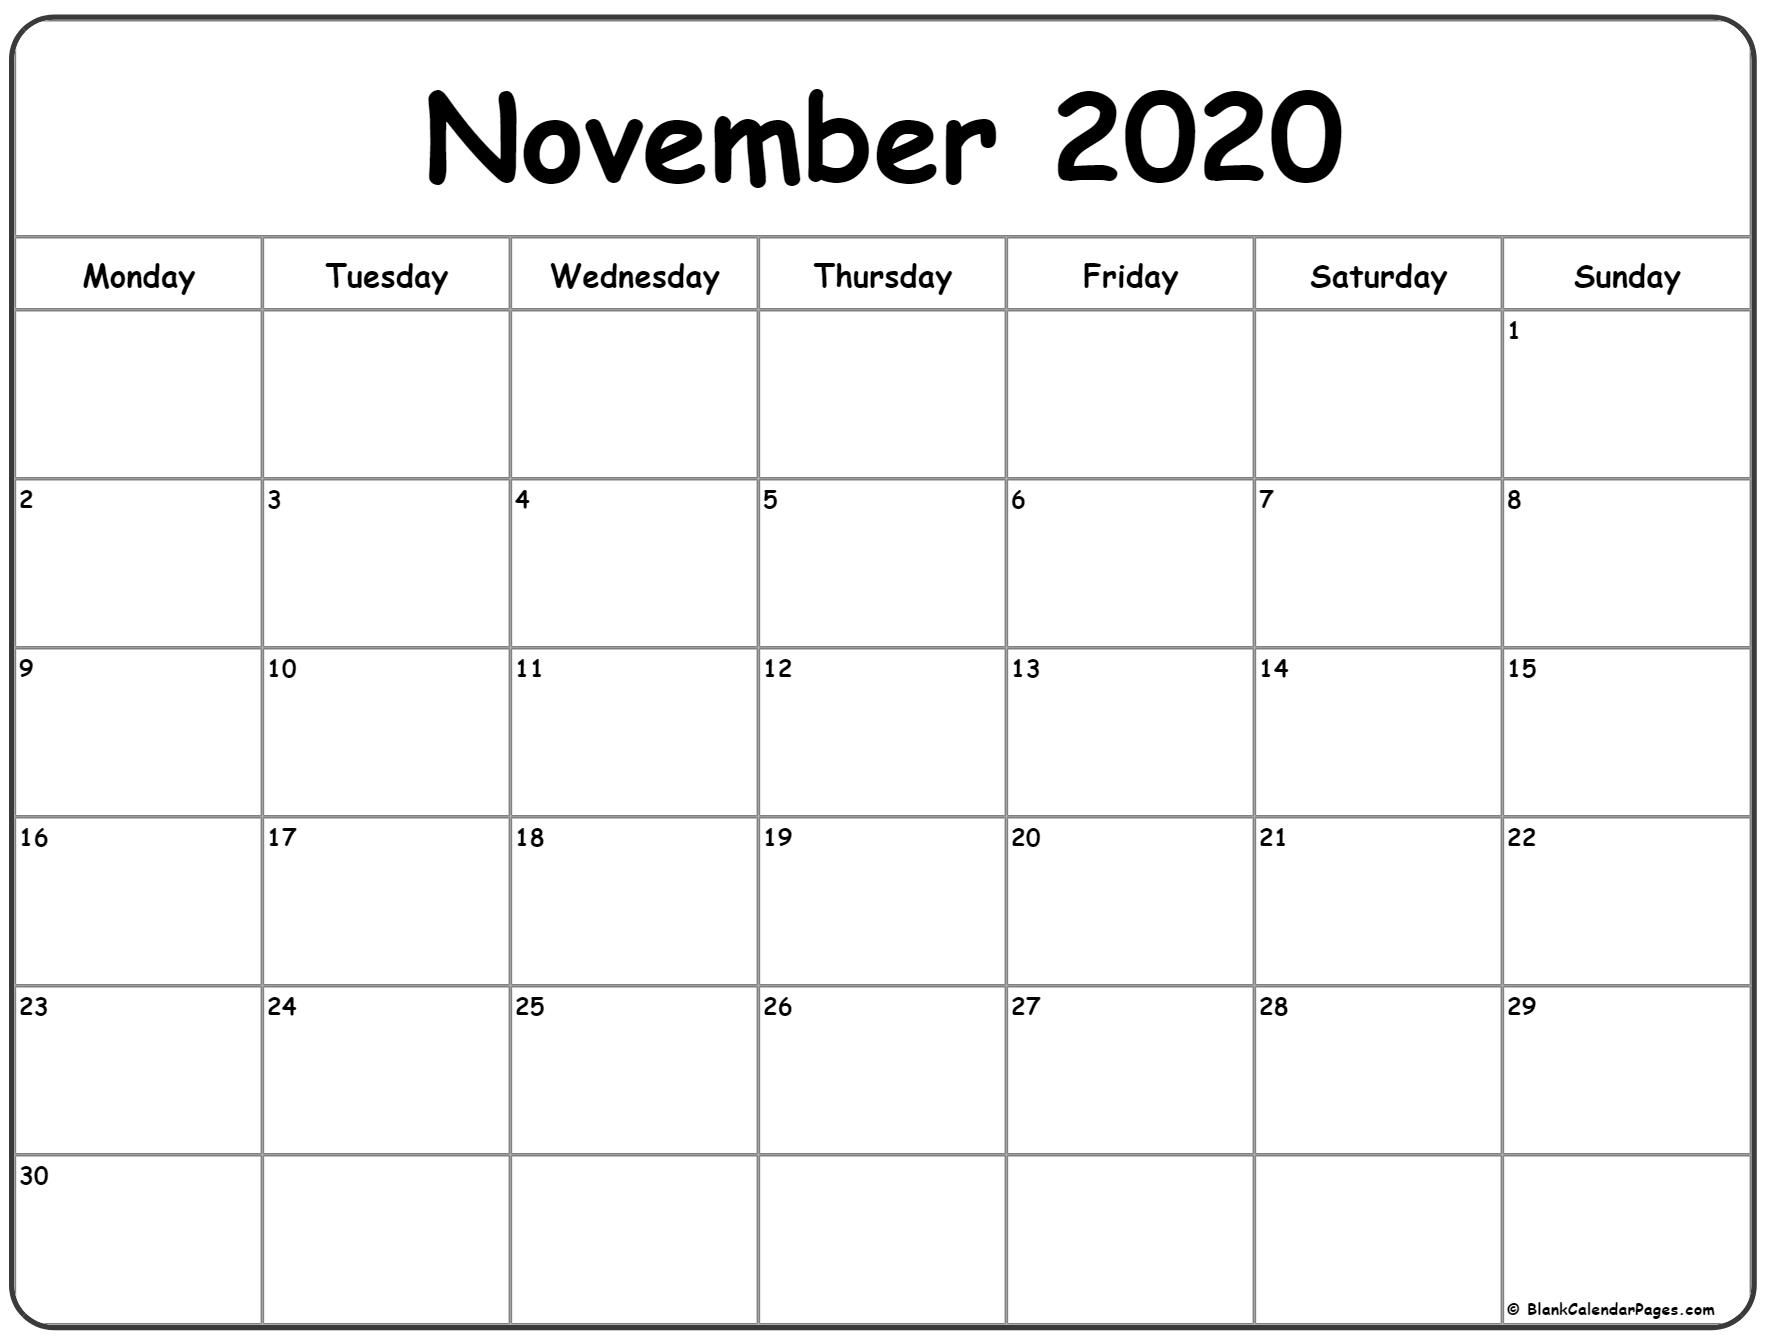 November 2020 Monday Calendar | Monday To Sunday In 2020 for Printable Monday To Sunday 2020 Calendar